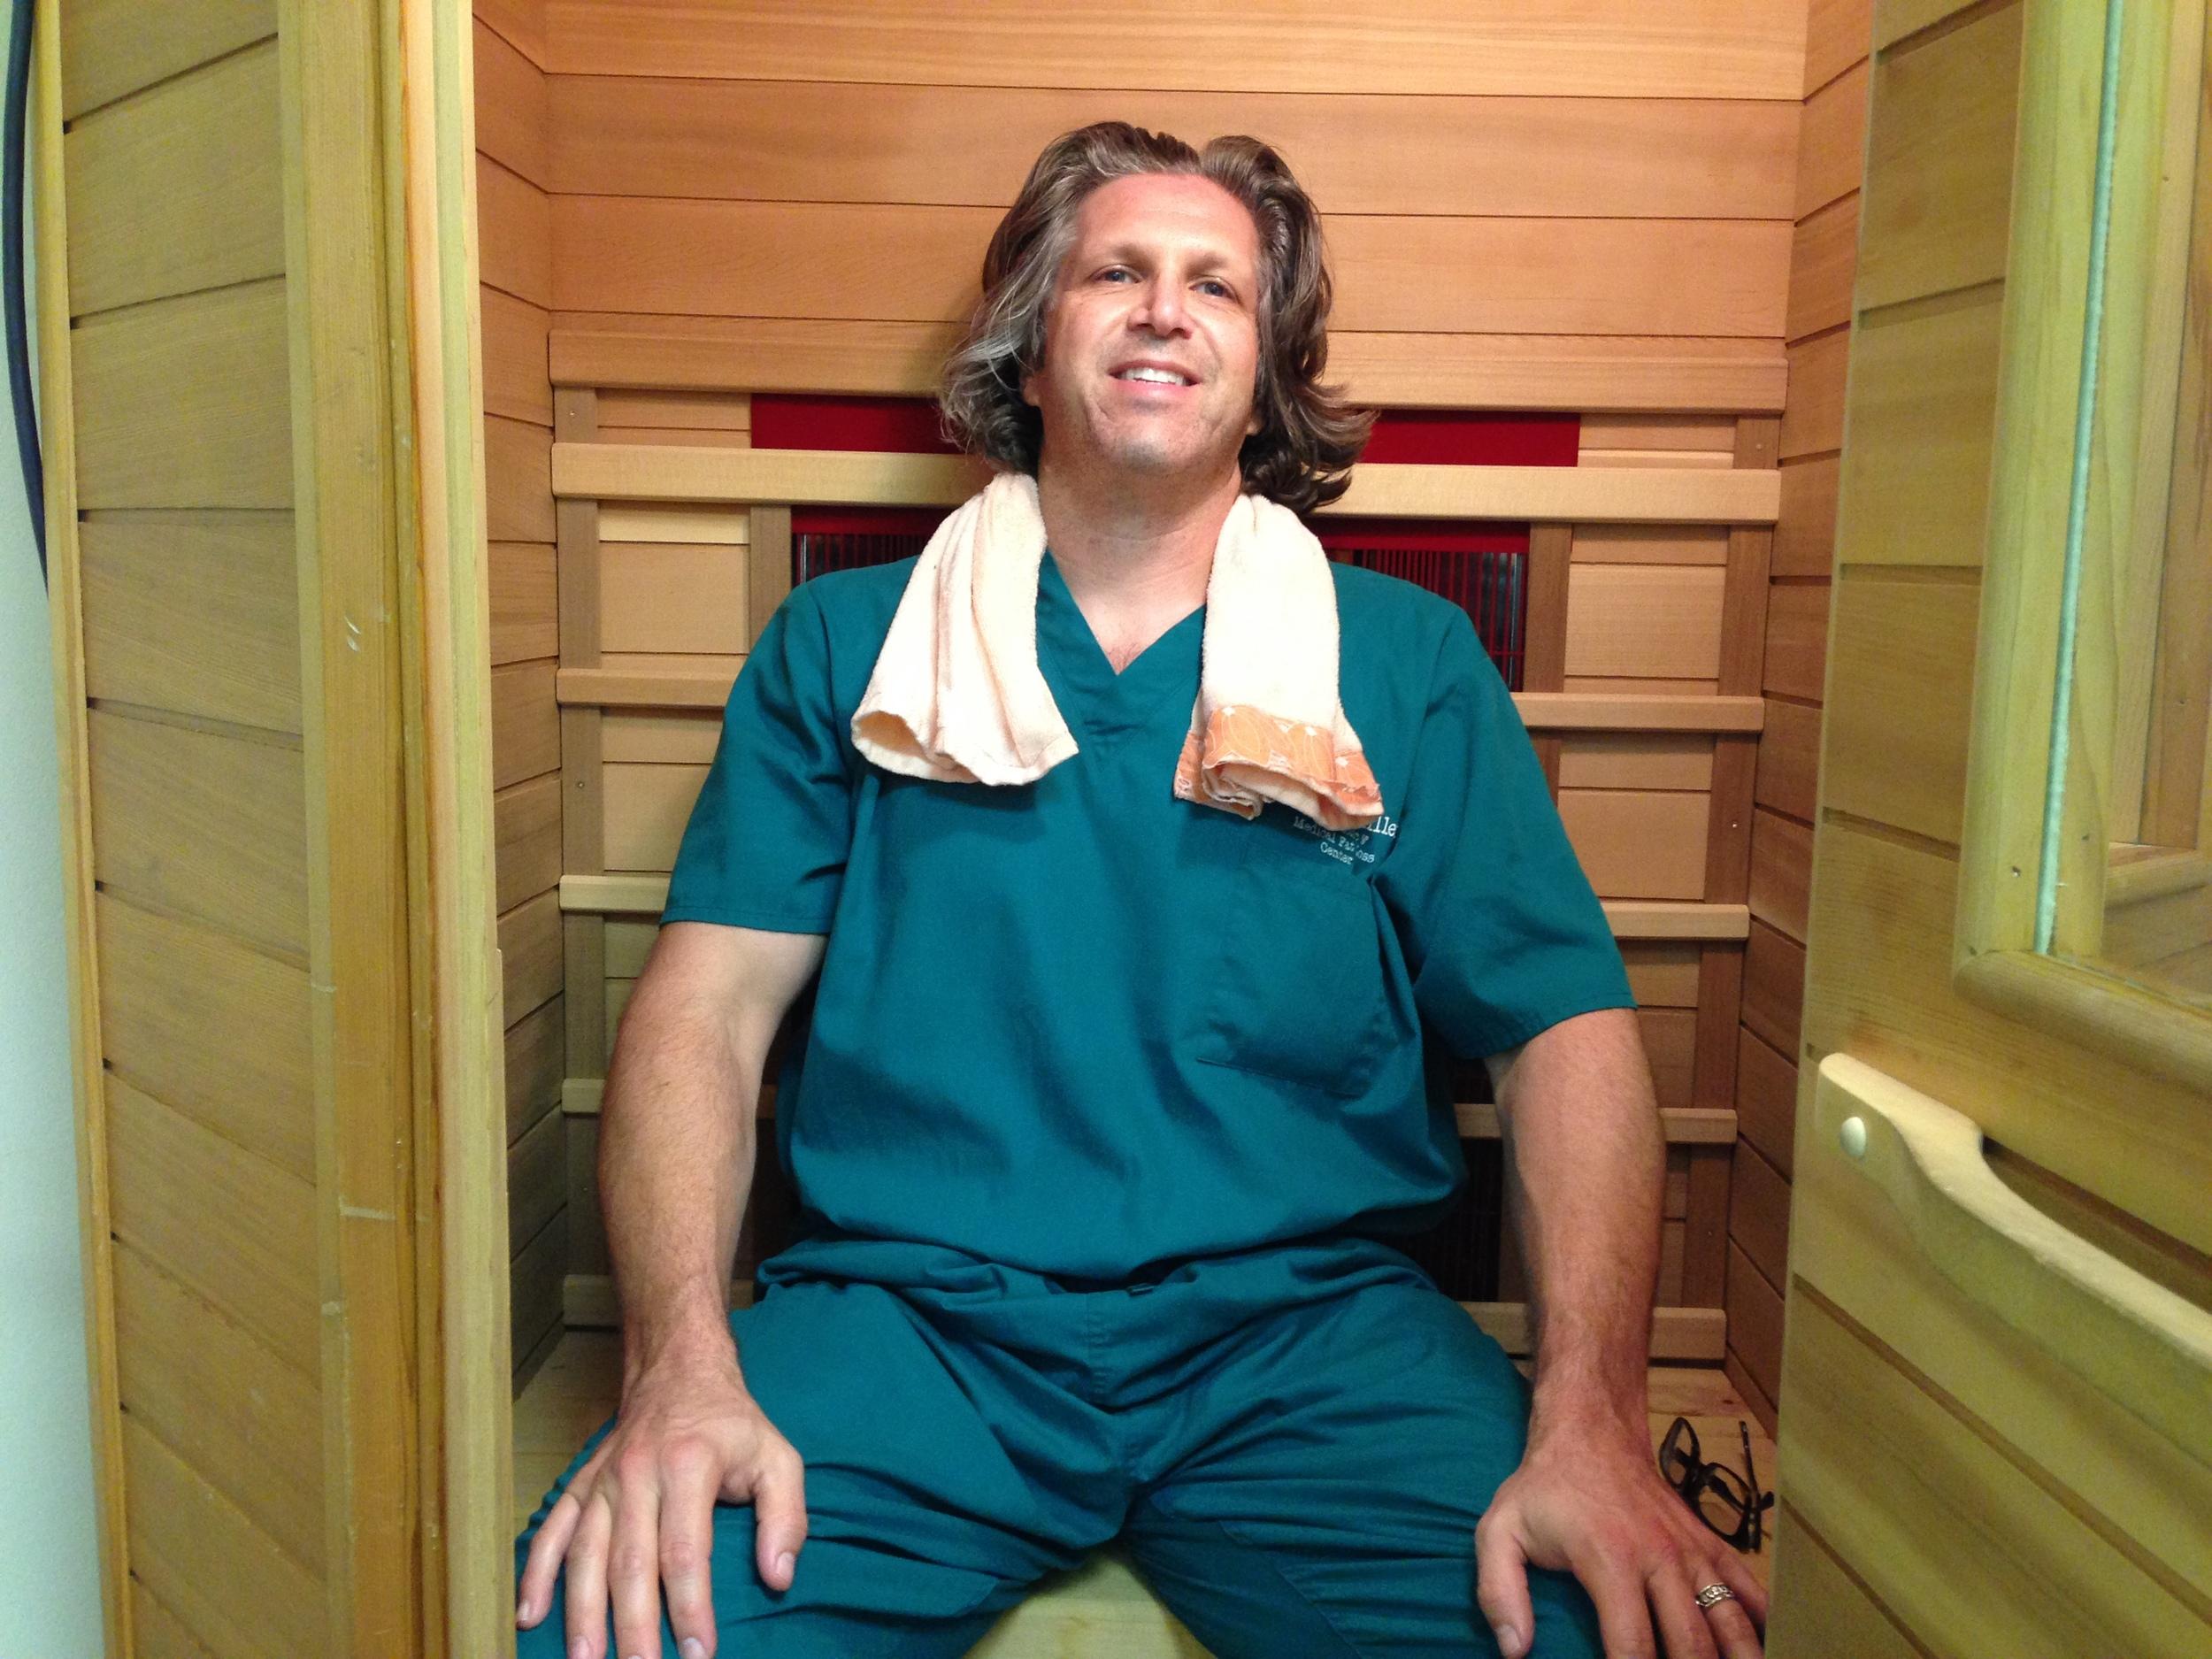 Dr. Miller in his sauna.